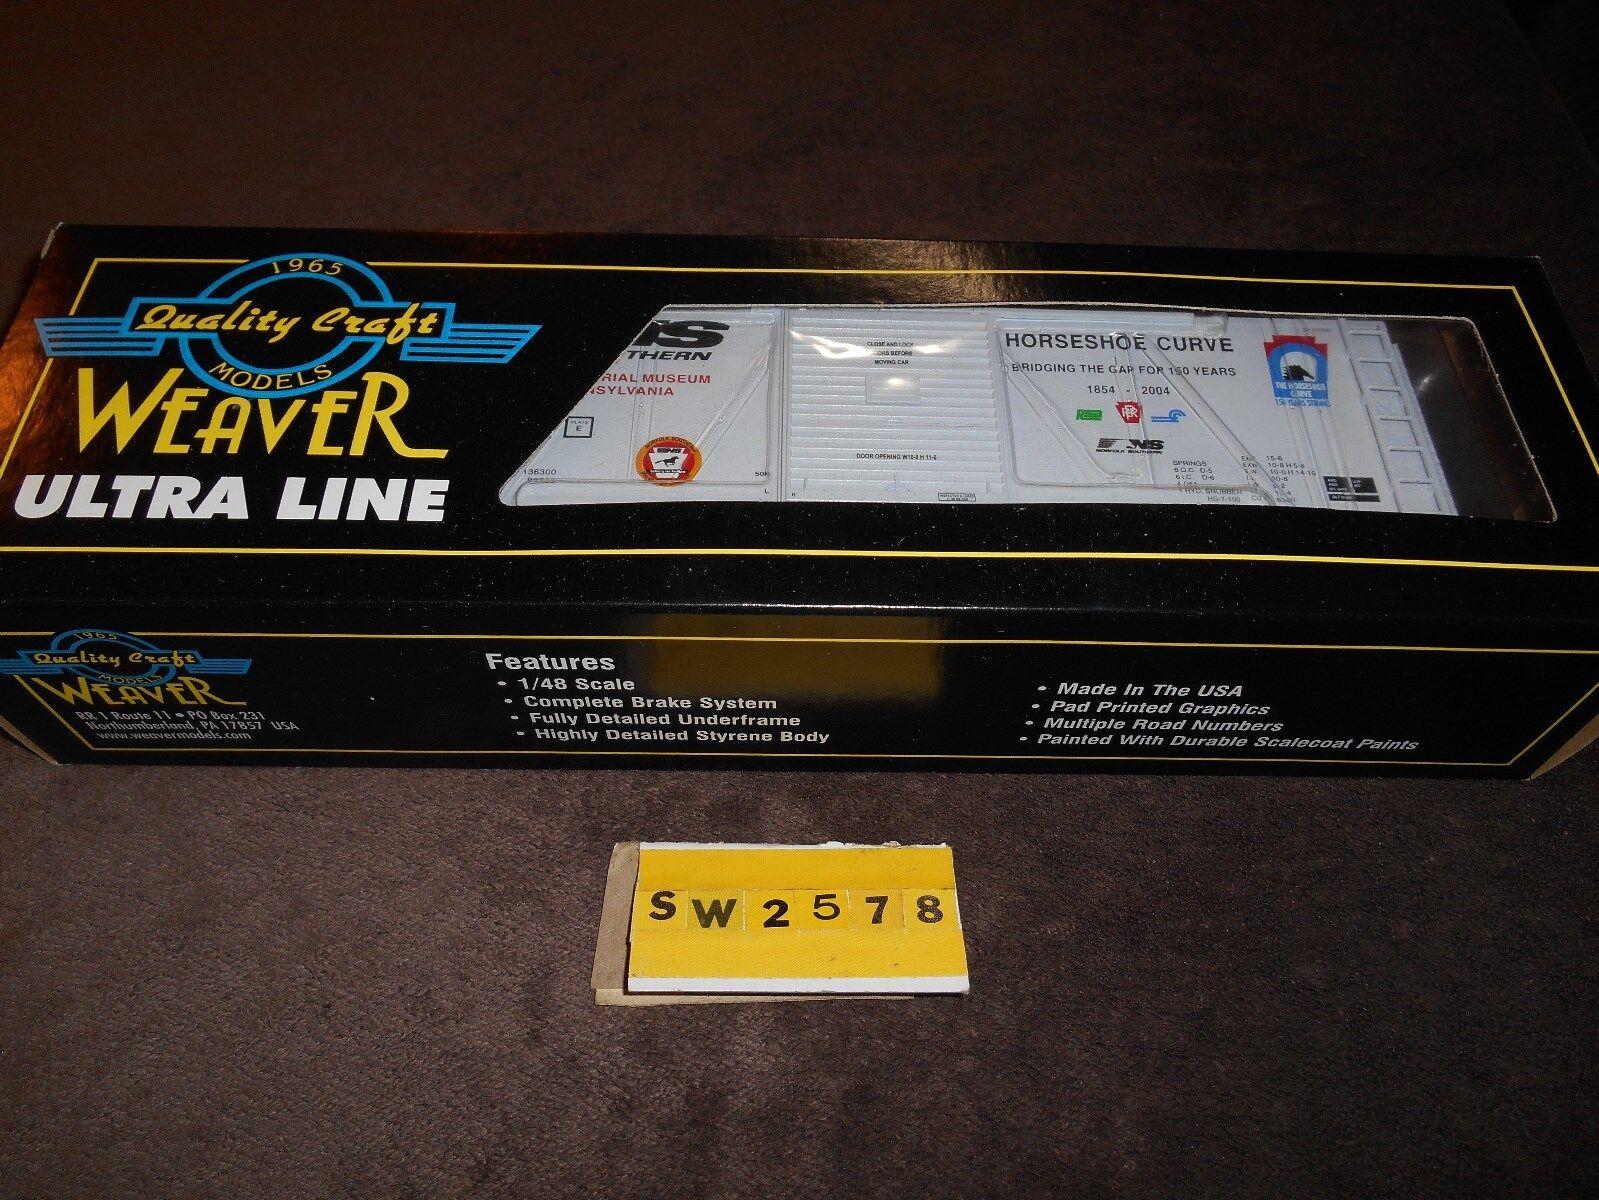 WEAVER'S HORSEHOE CURVE PS1, 40' ALTOONA RR MUSEUM scatola auto, BRe nuovo